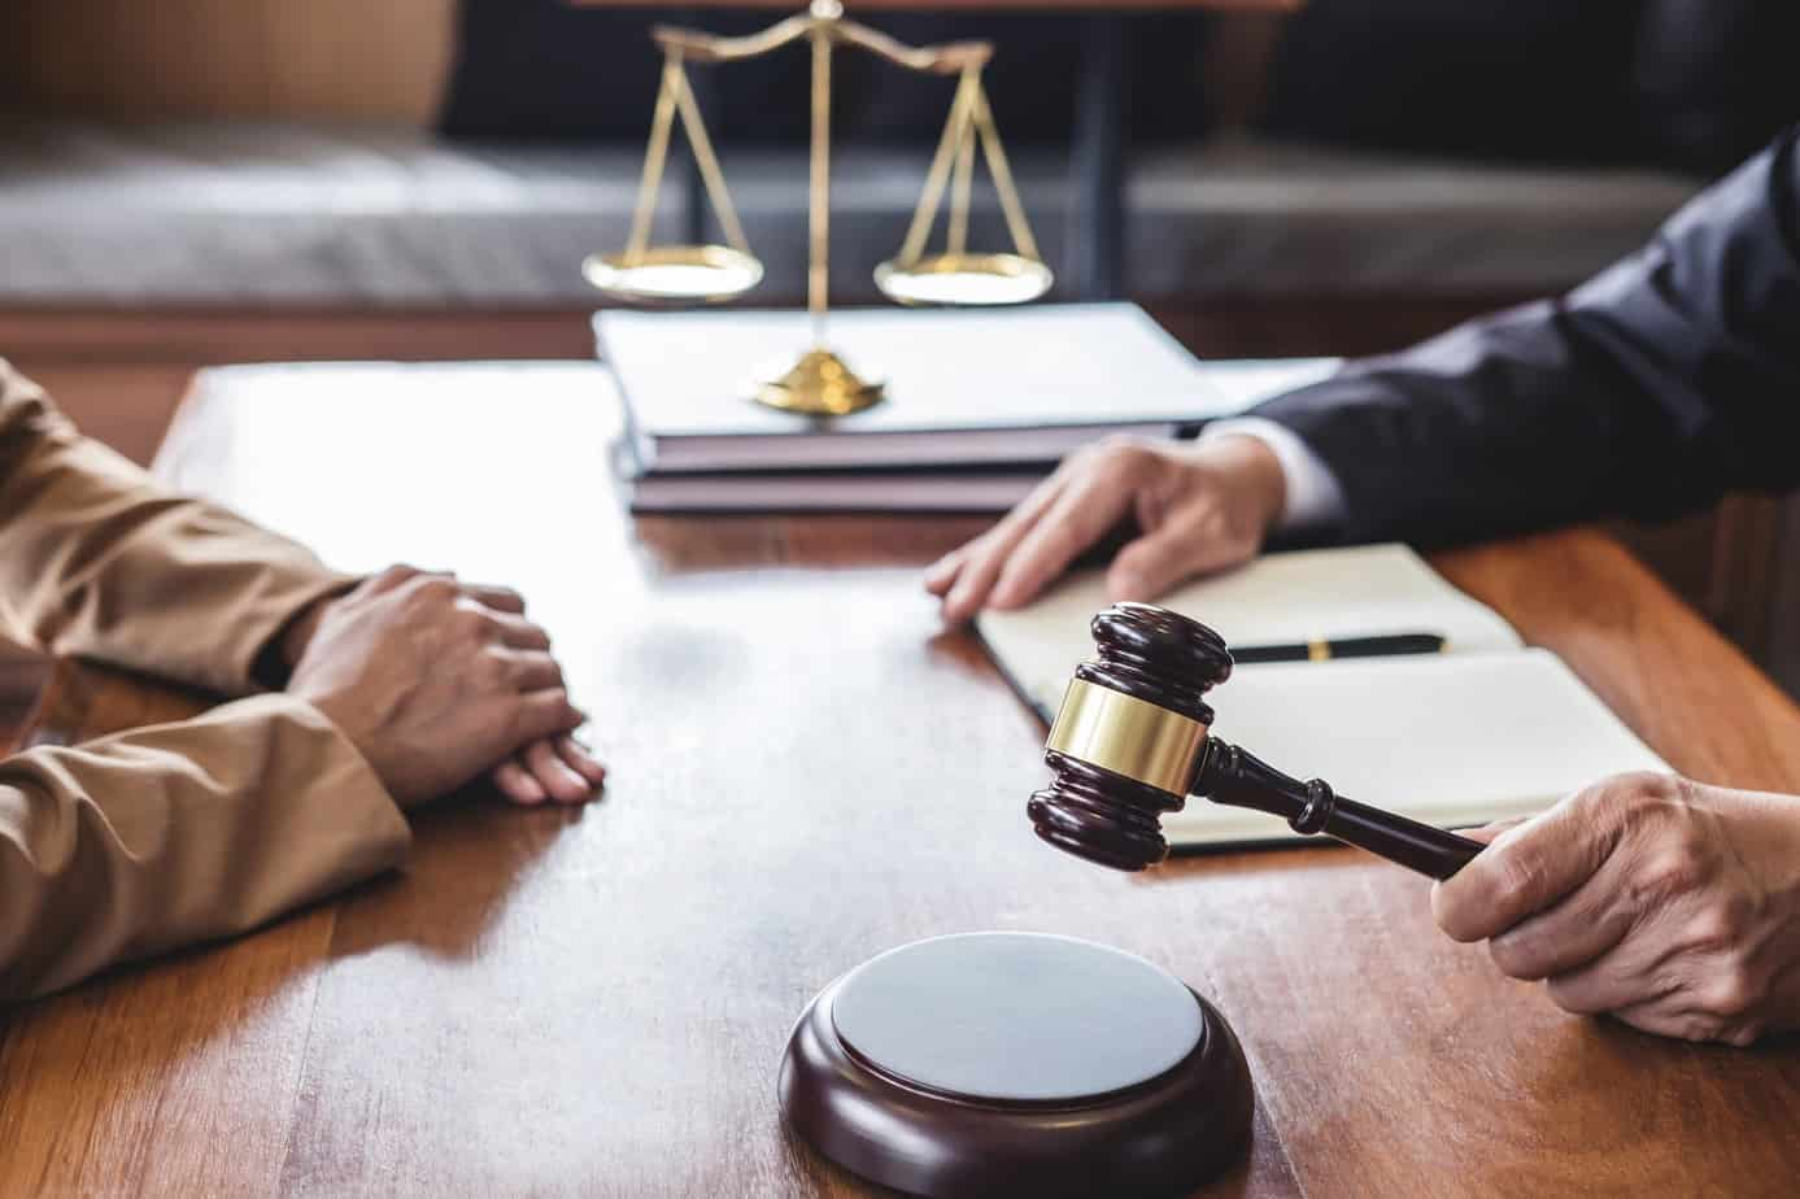 רישום הערת אזהרה - עורך דין עמית סלע תל אביב